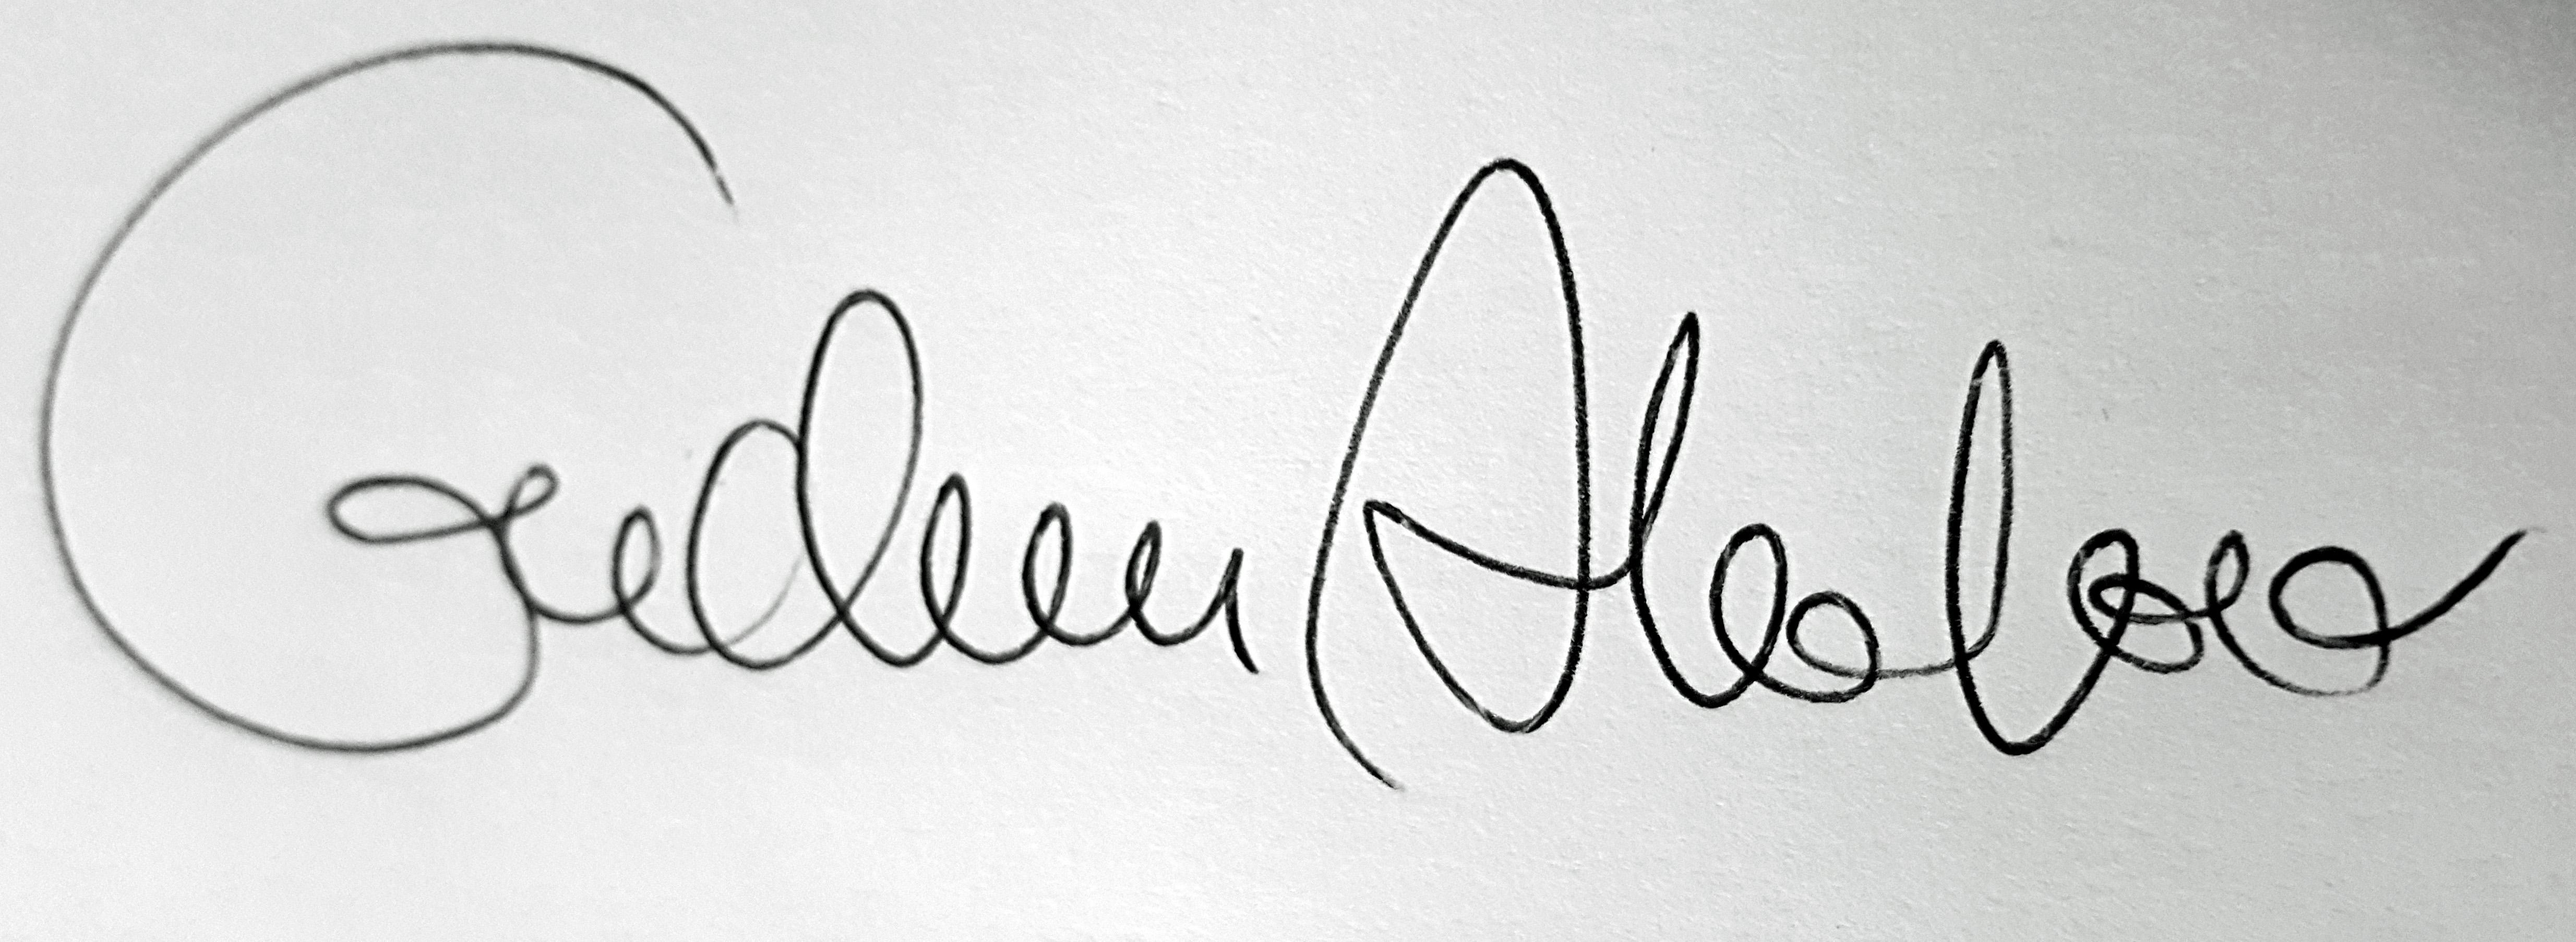 Gudrun Alvebro's Signature